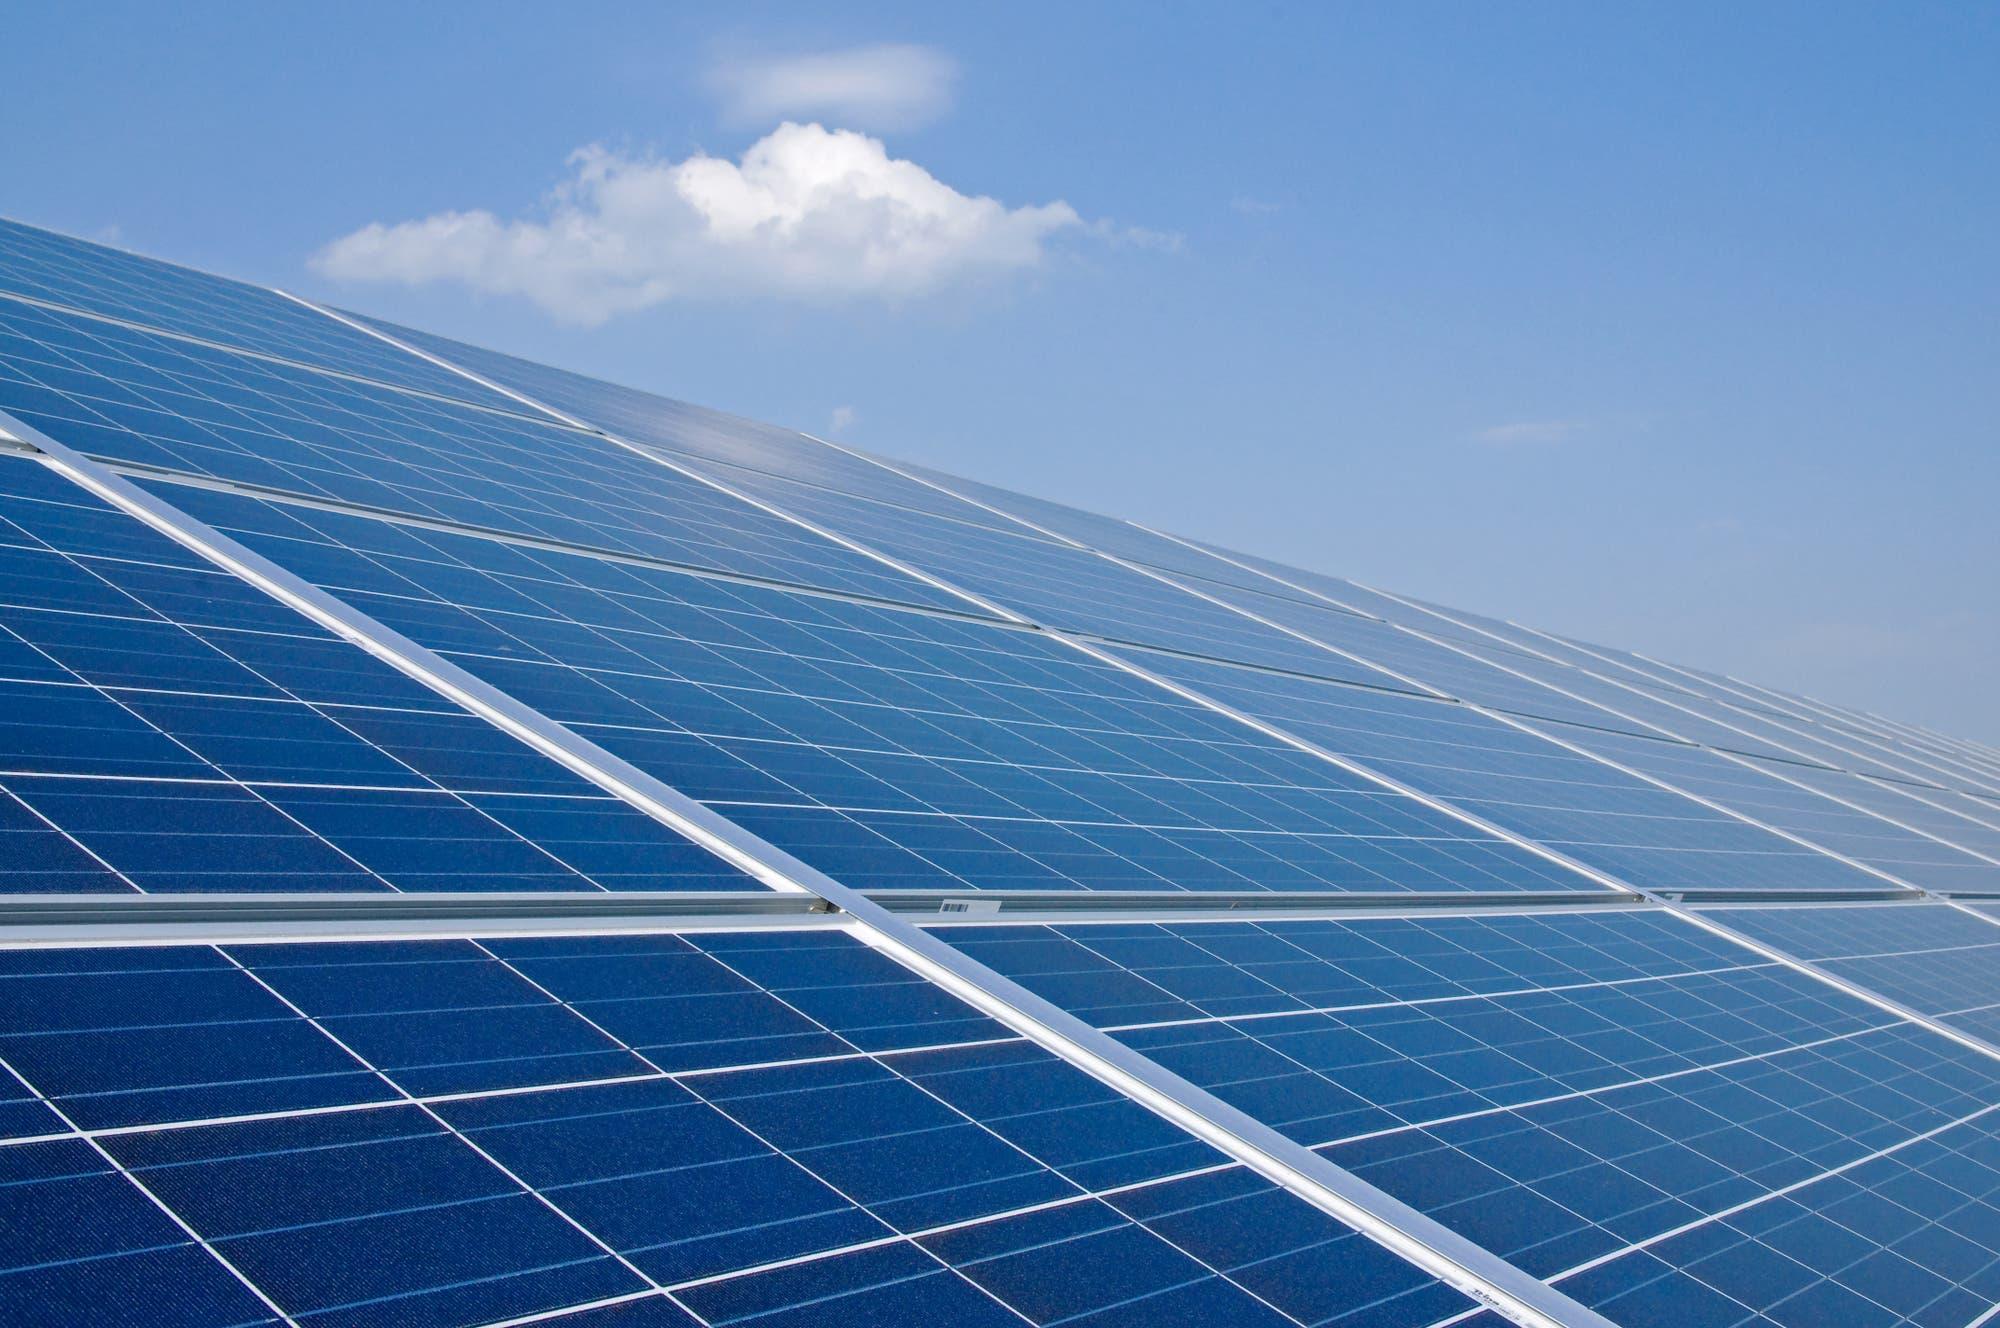 Solarzellen vor blauem Himmel